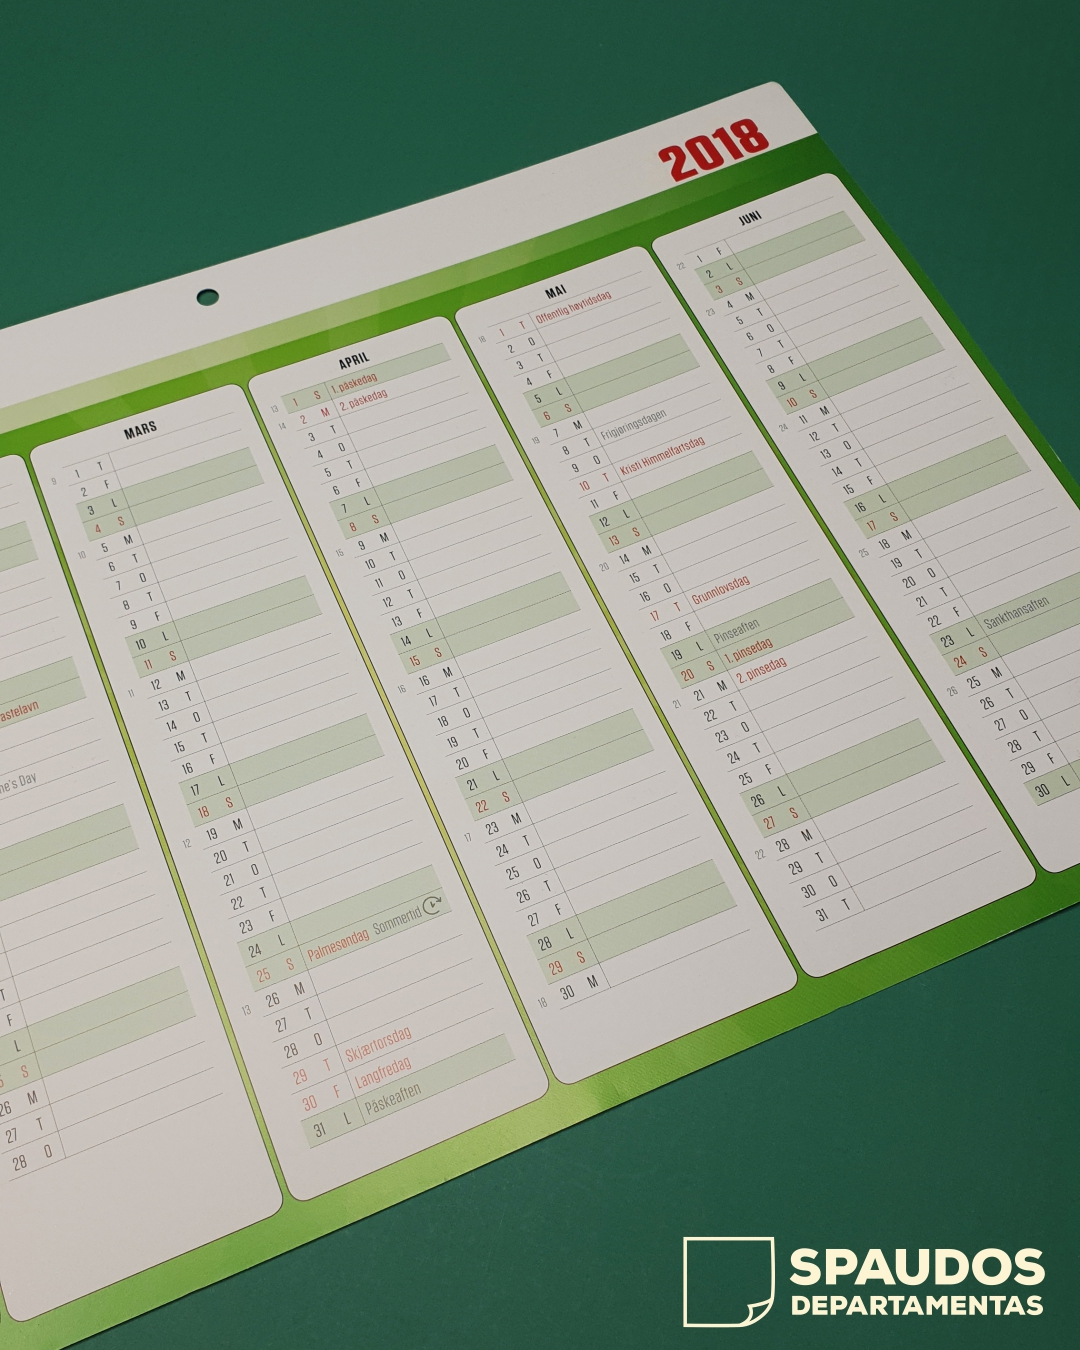 Darbo kalendorius 2021 | Spaudos Departamentas